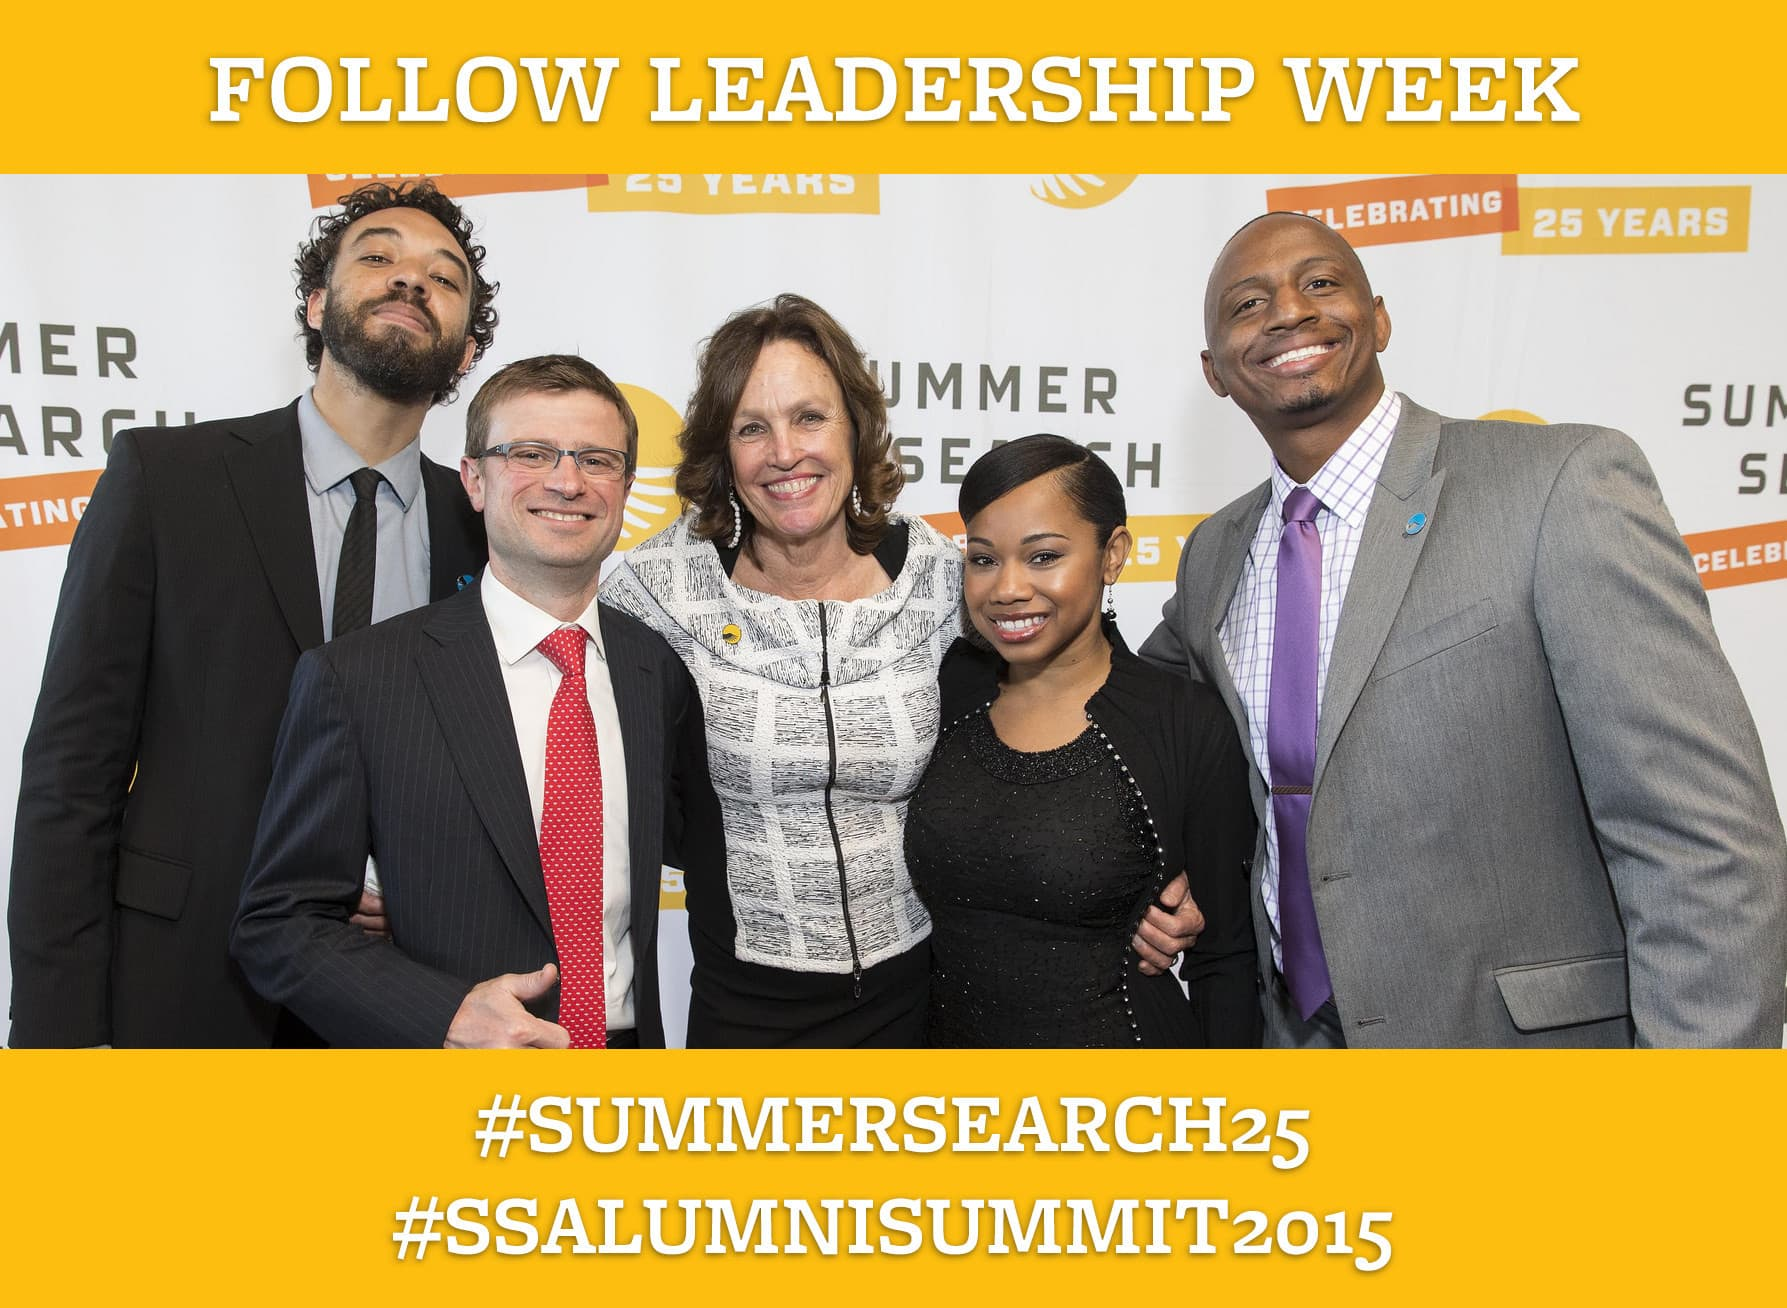 Follow-Leadership-Week